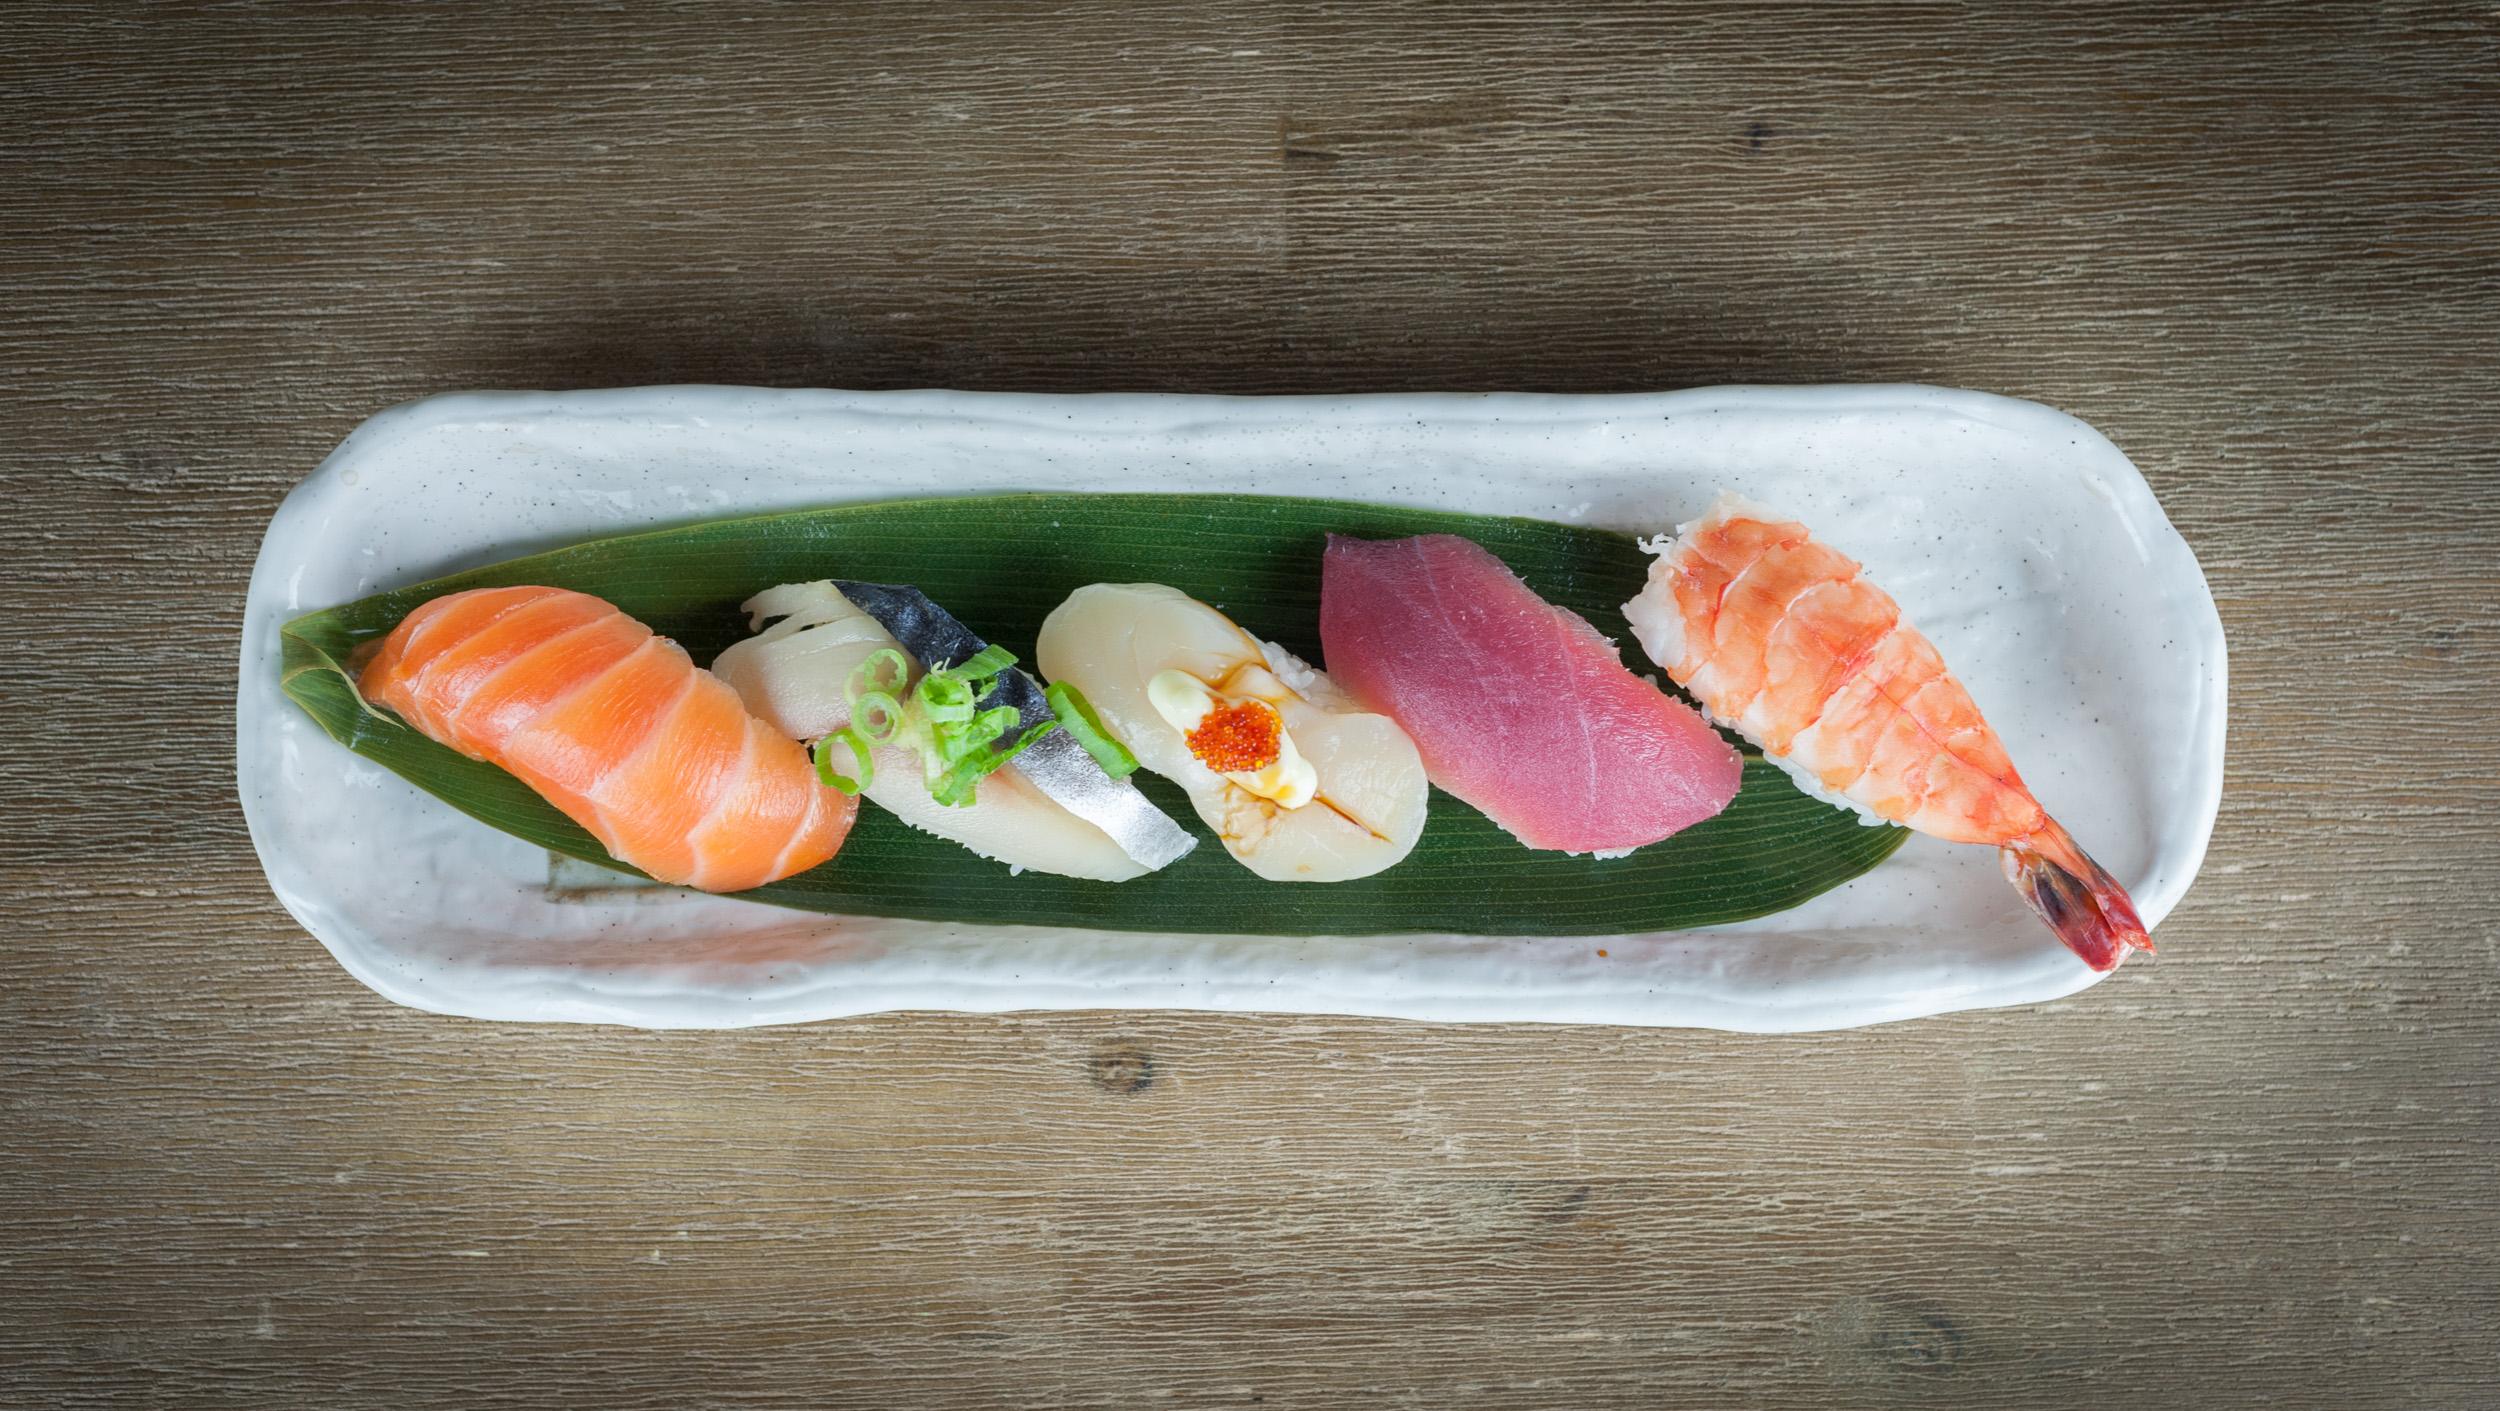 ke-image ke Charcoal Grill & Sushi